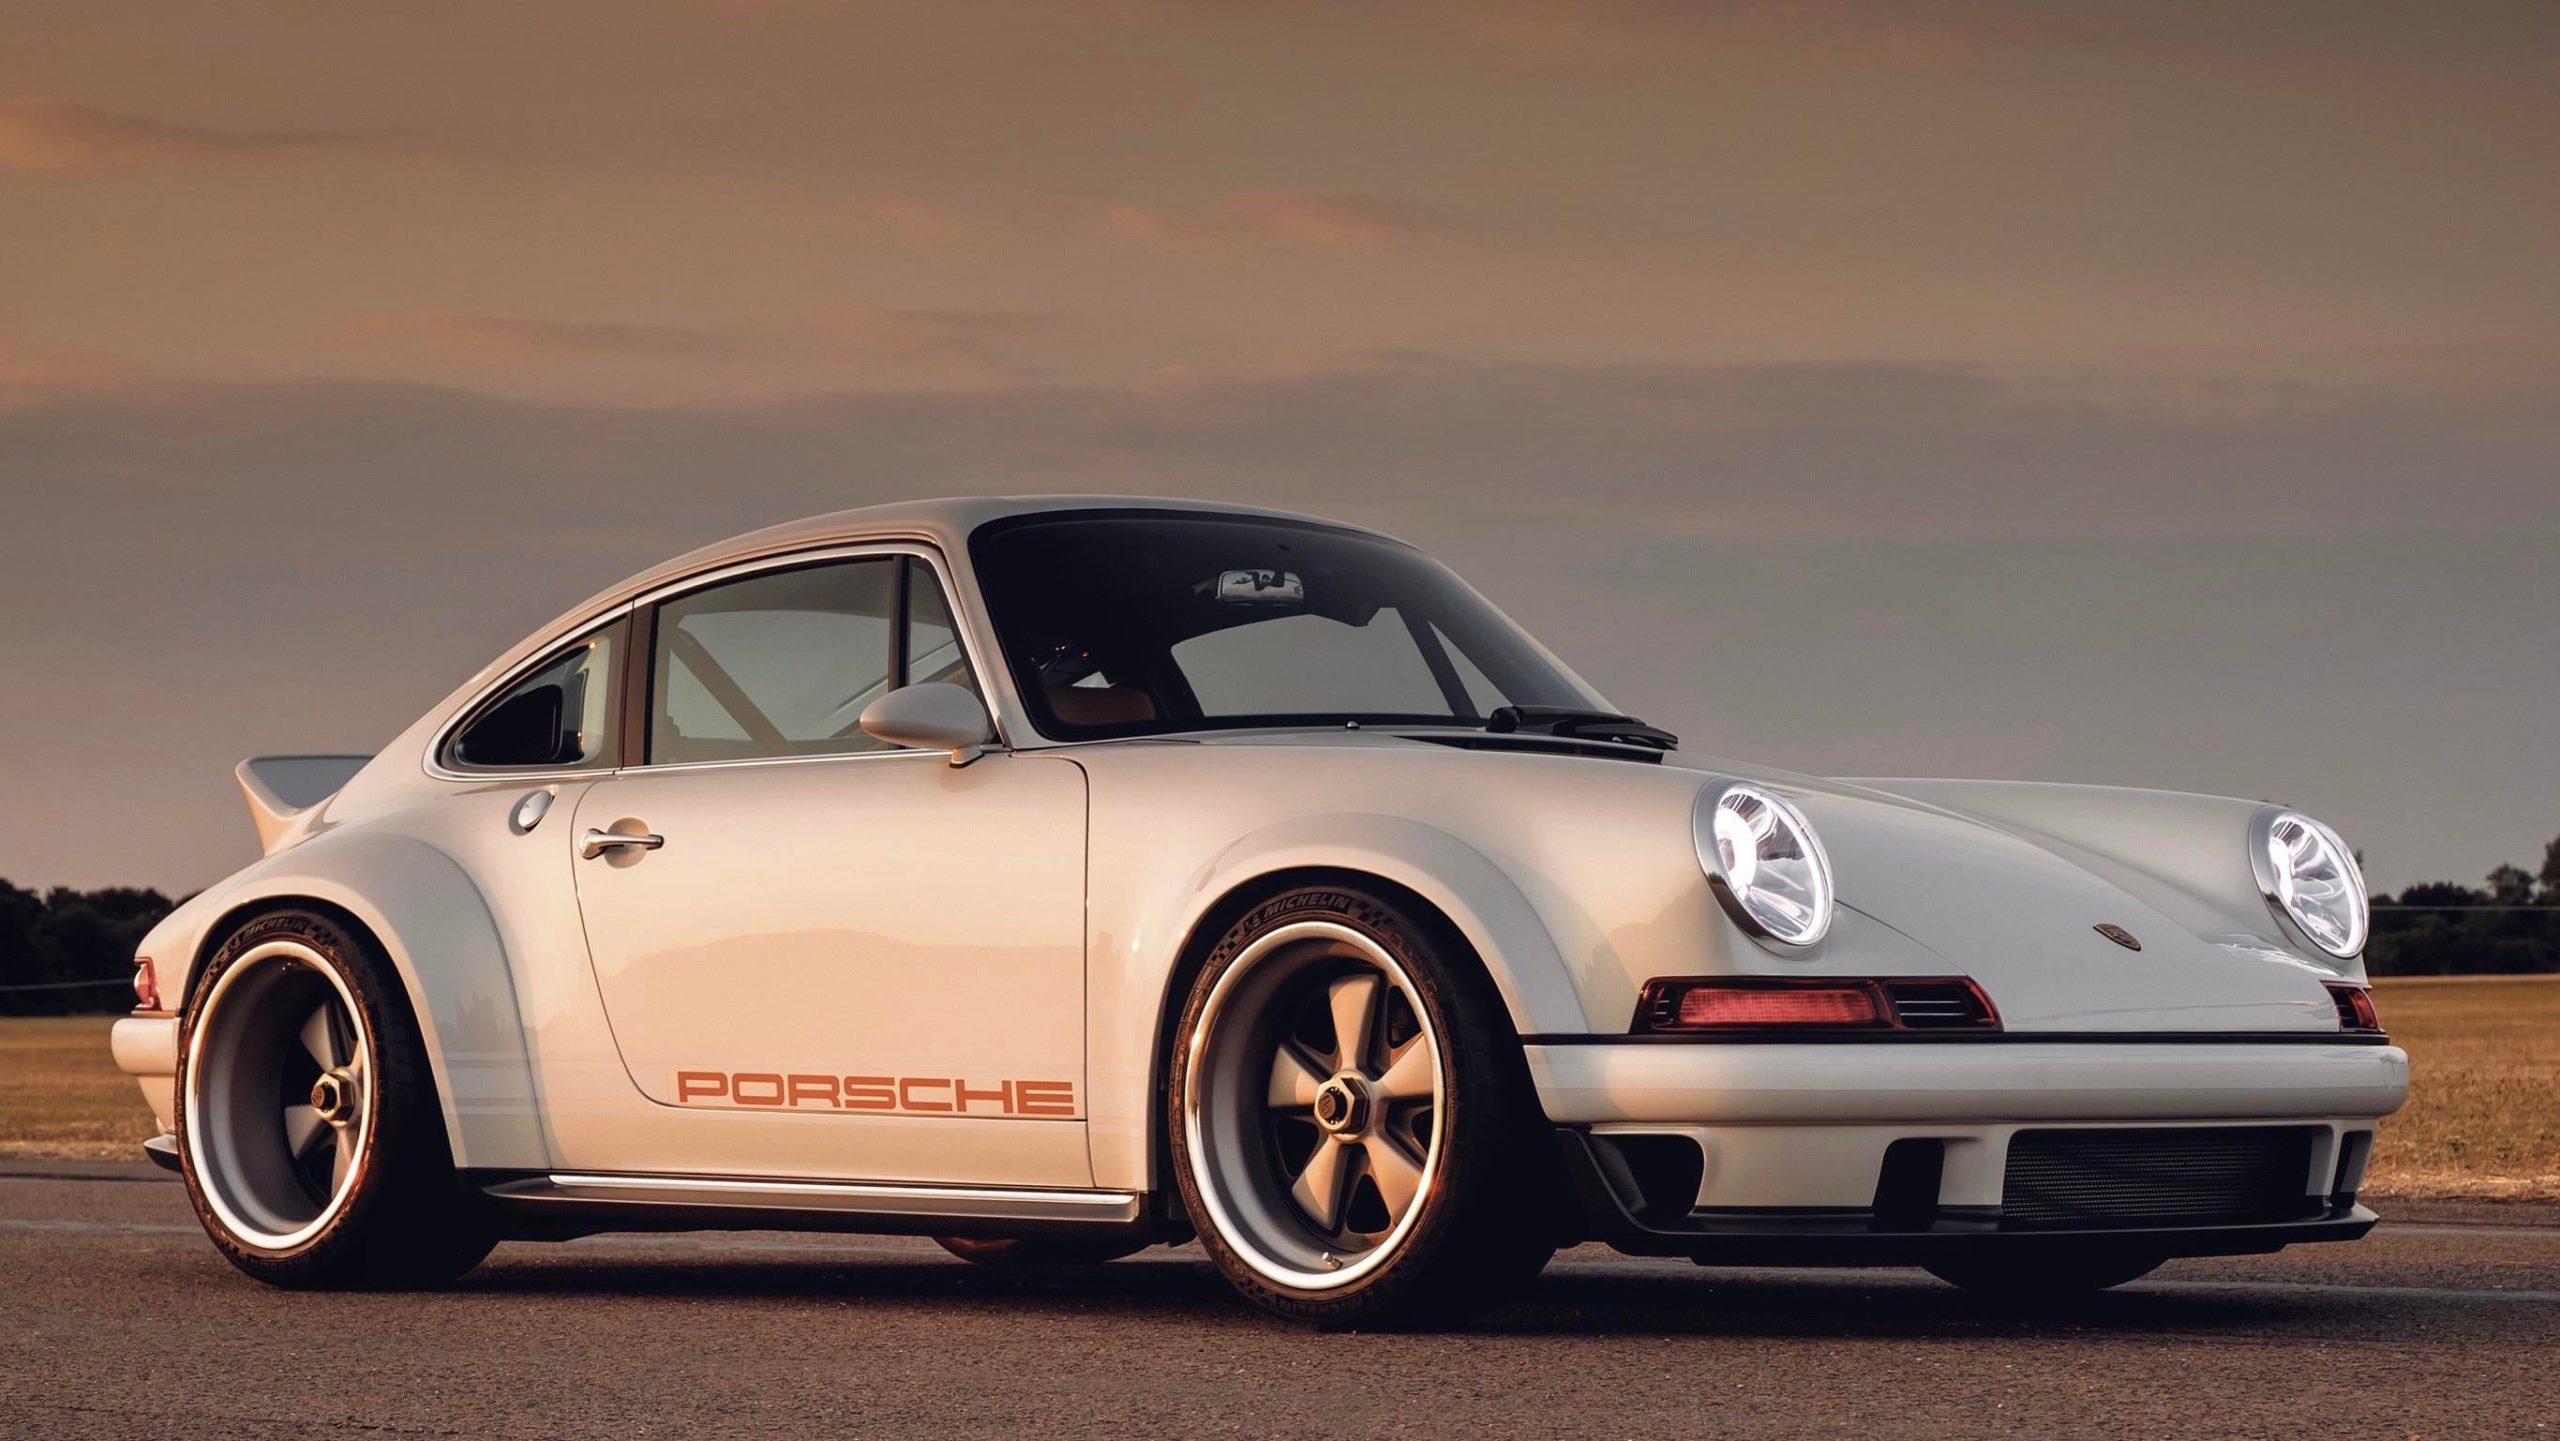 Old School Porsche still looks great!